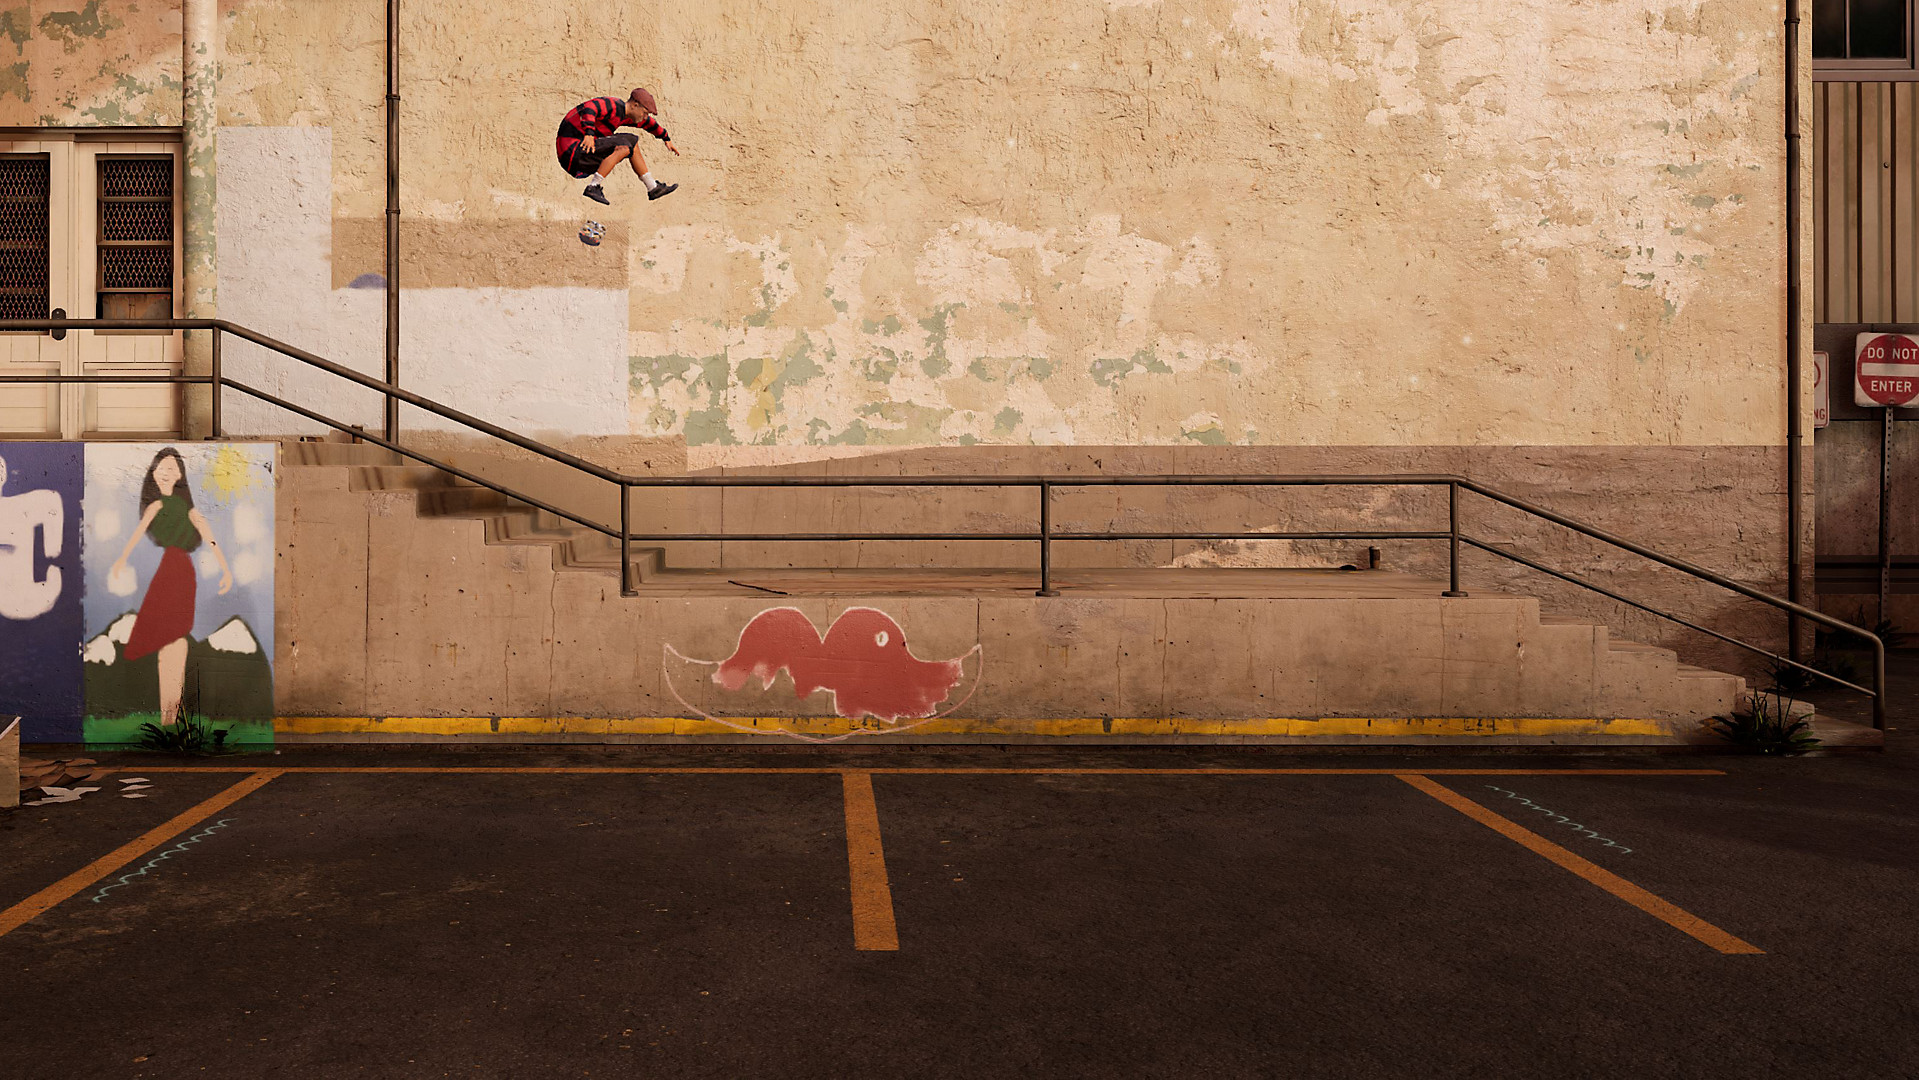 Tony Hawk's Pro Skater 1+2 gameplay - all songs